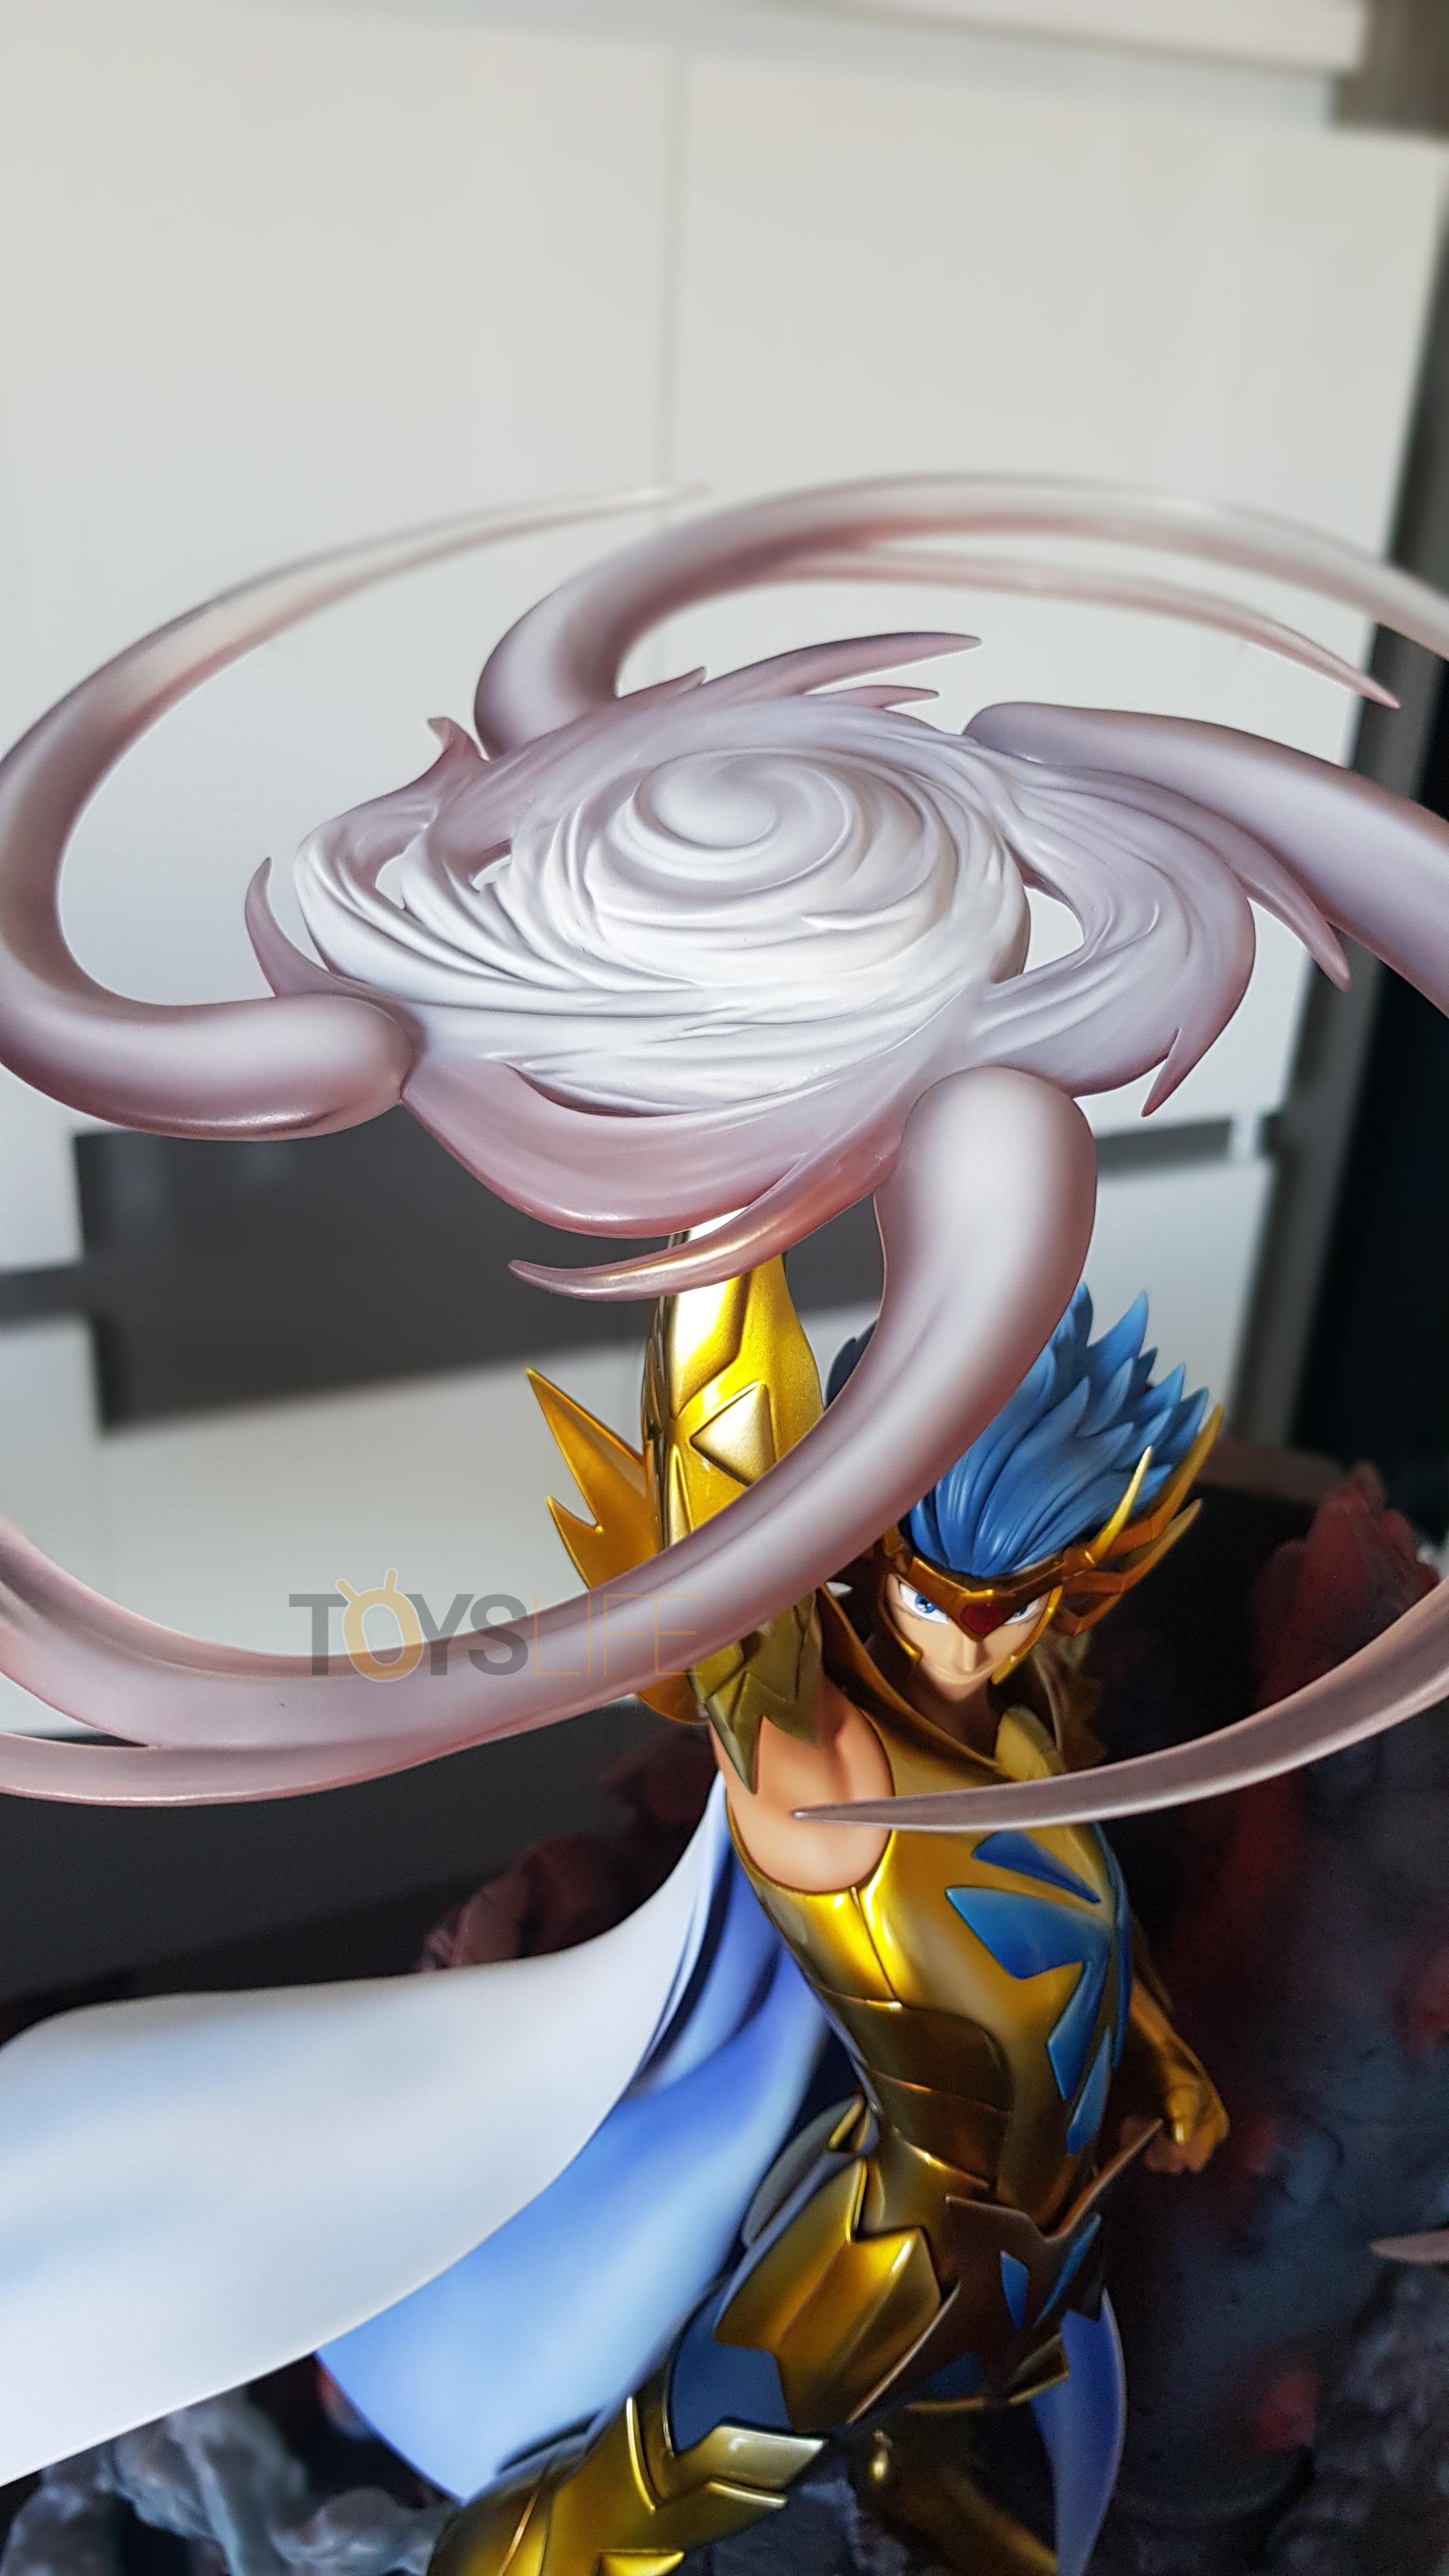 tsume-art-saint-seiya-gold-saint-death-mask-statue-toyslife-review-26